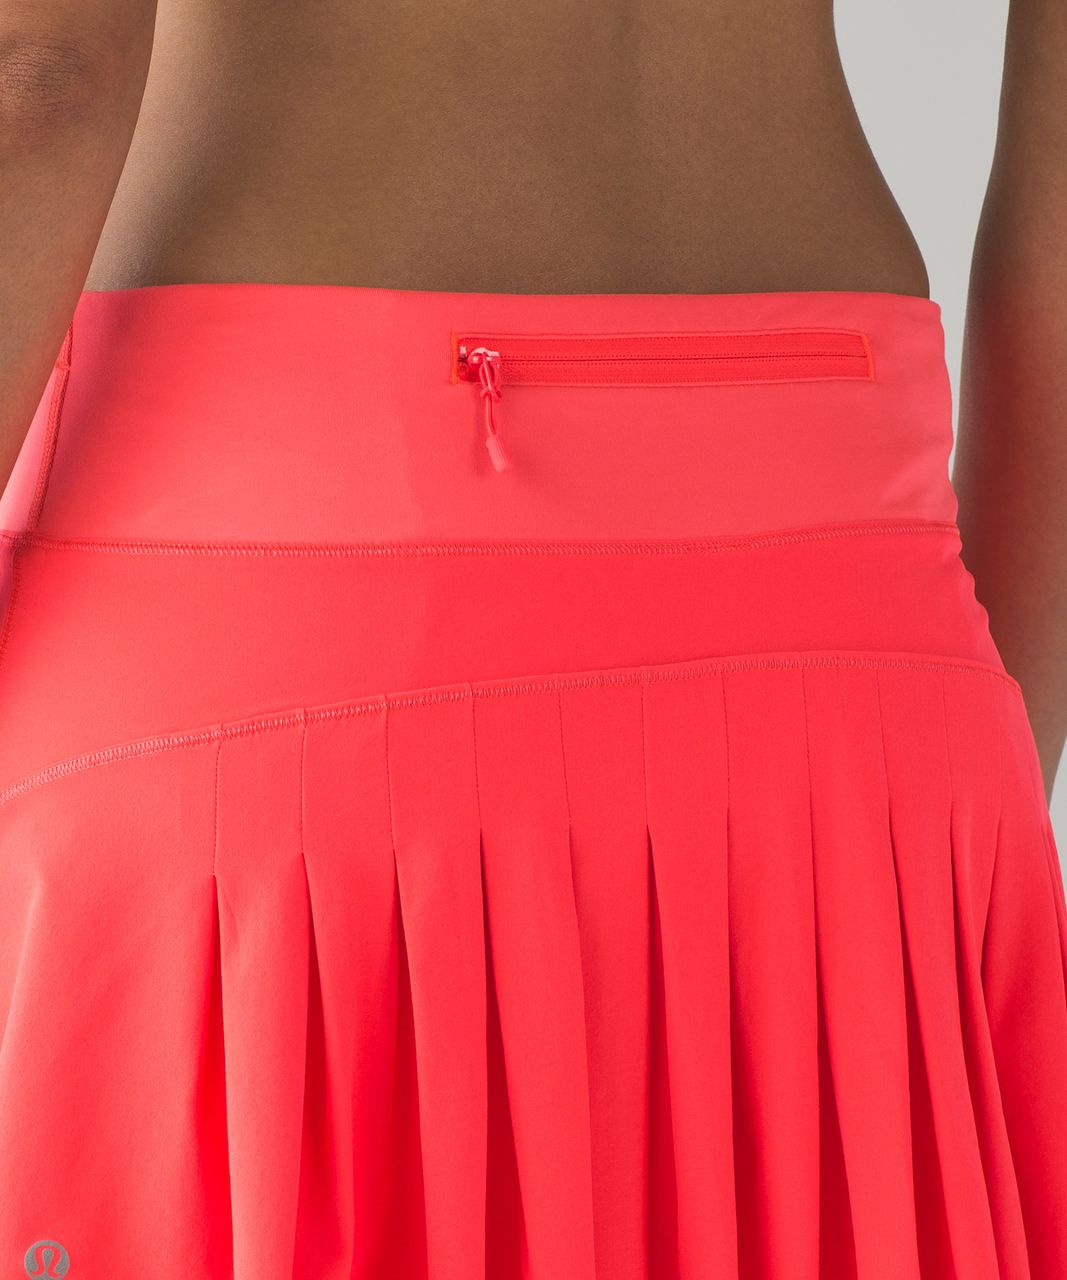 "Lululemon Circuit Breaker Skirt (Regular) (13"") - Electric Coral"